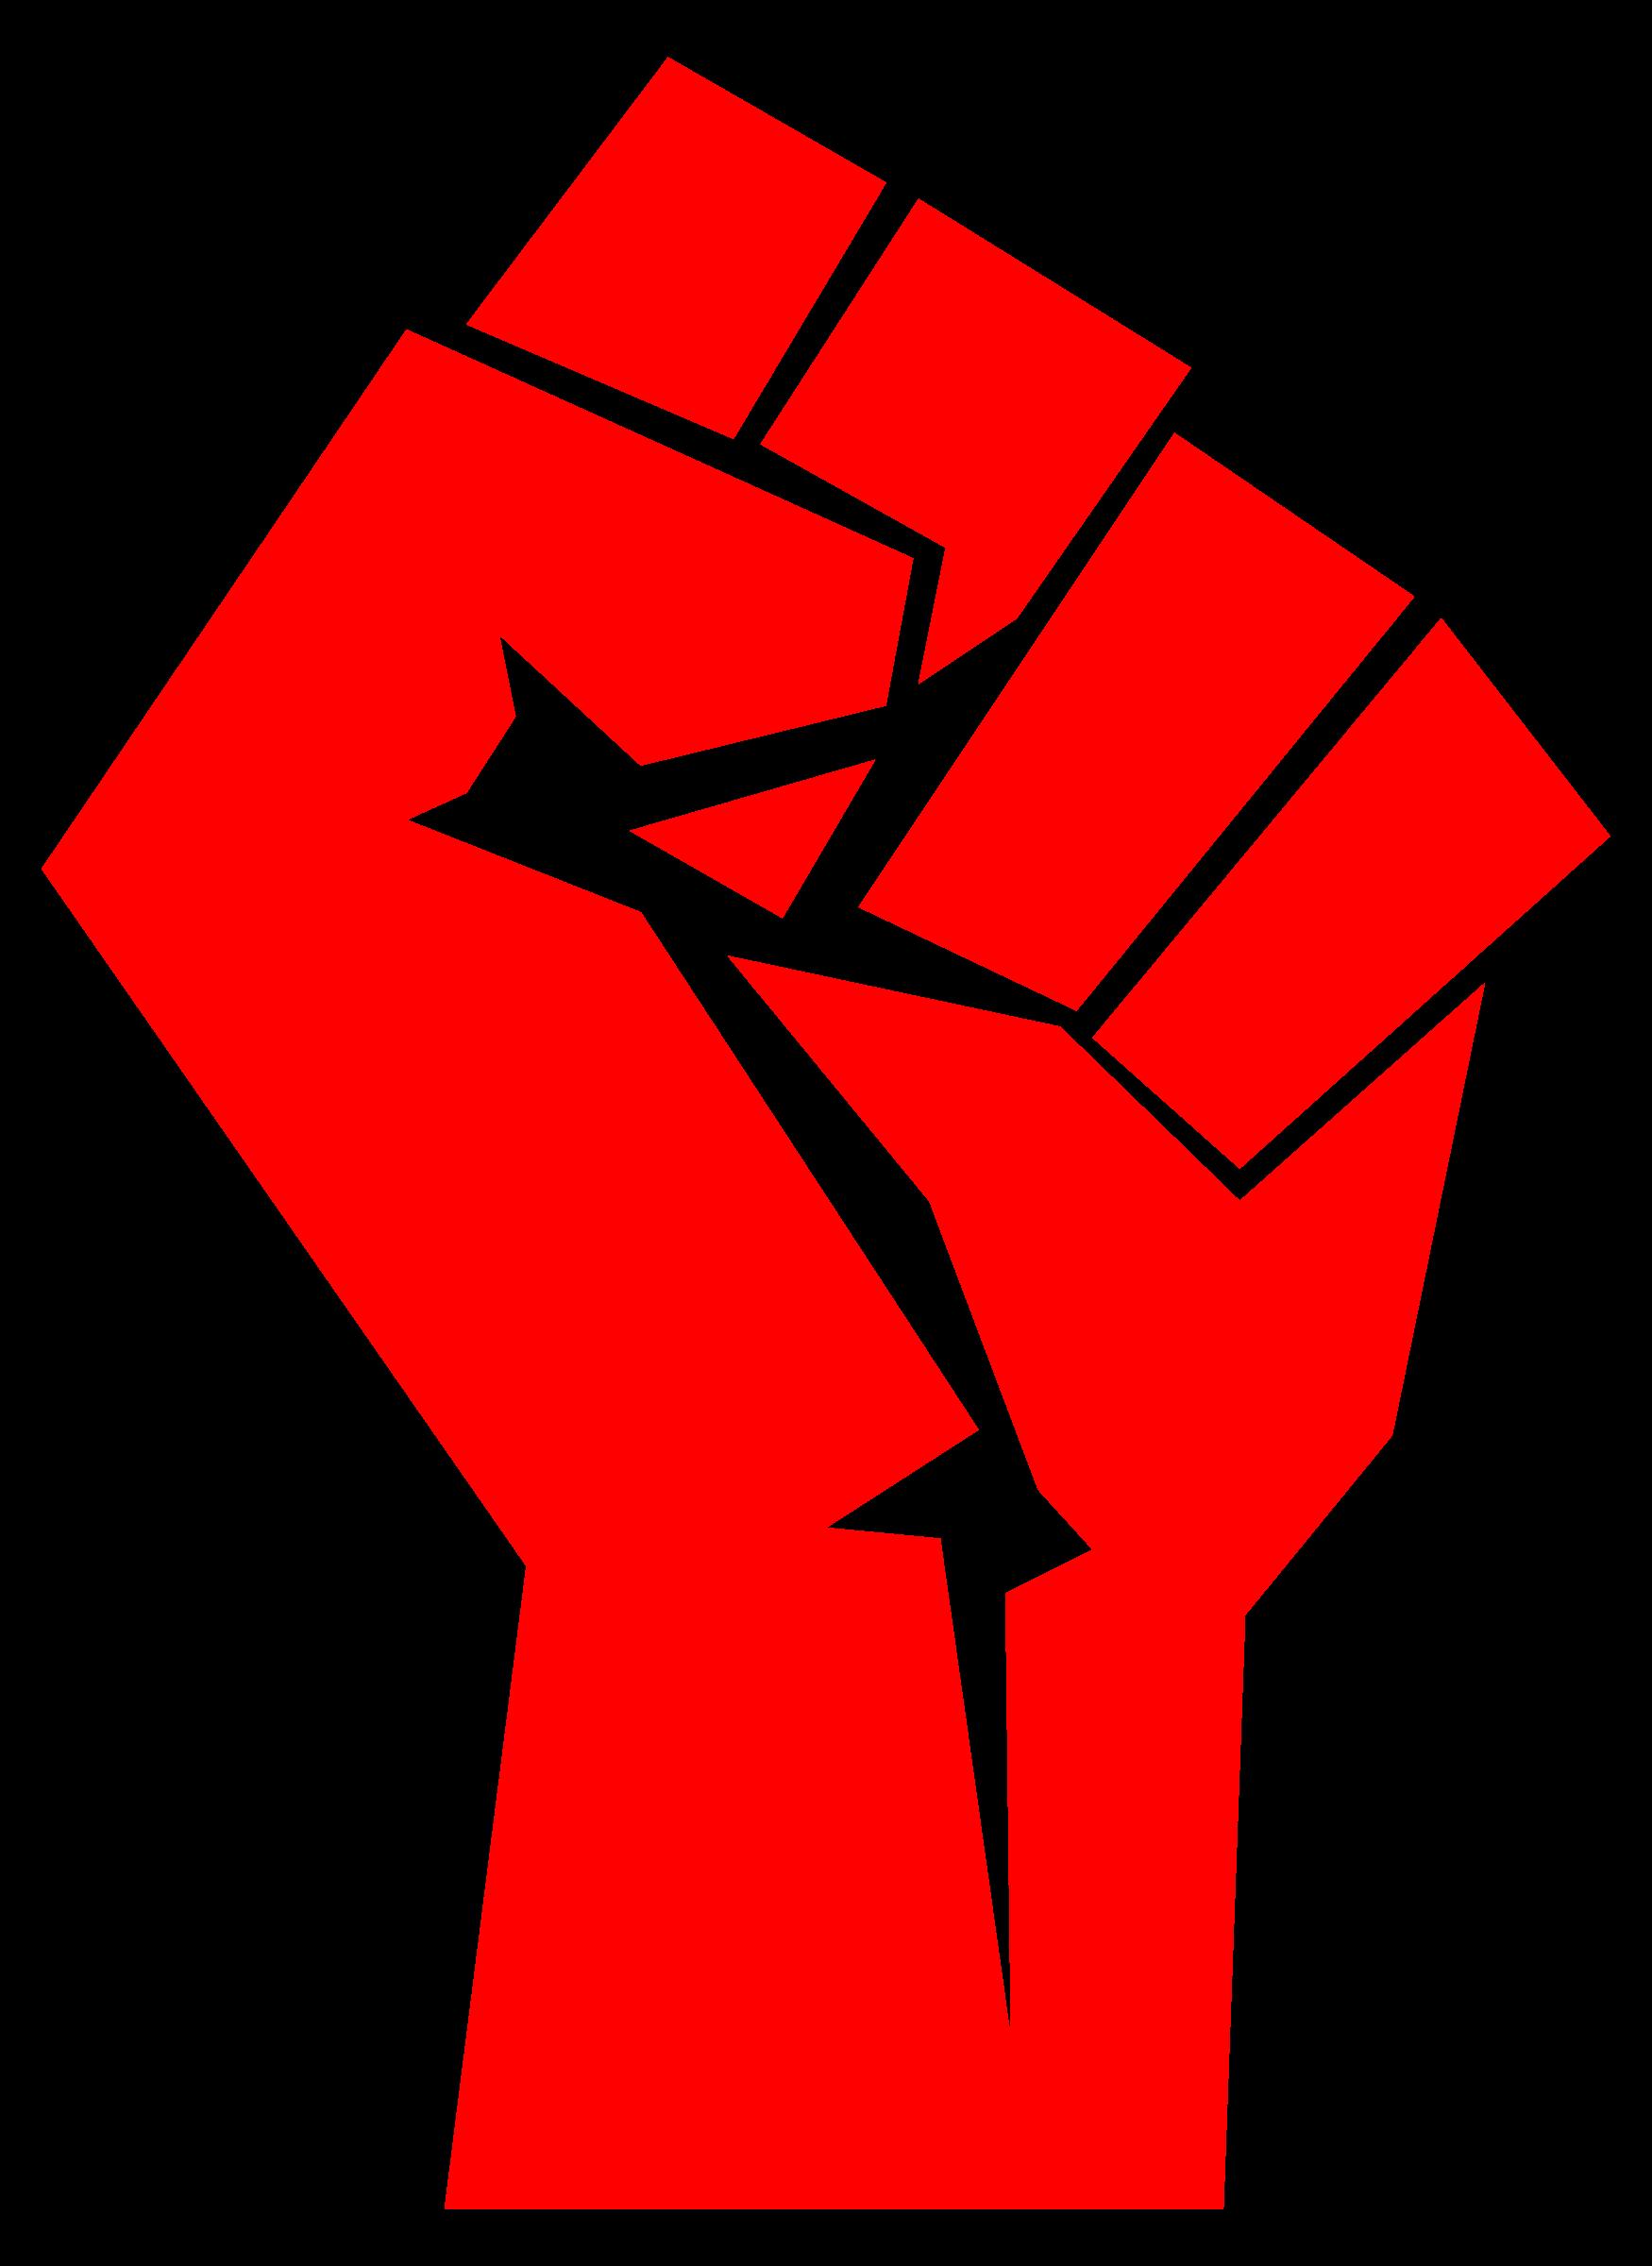 Fist clipart worker Fist Clipart fist